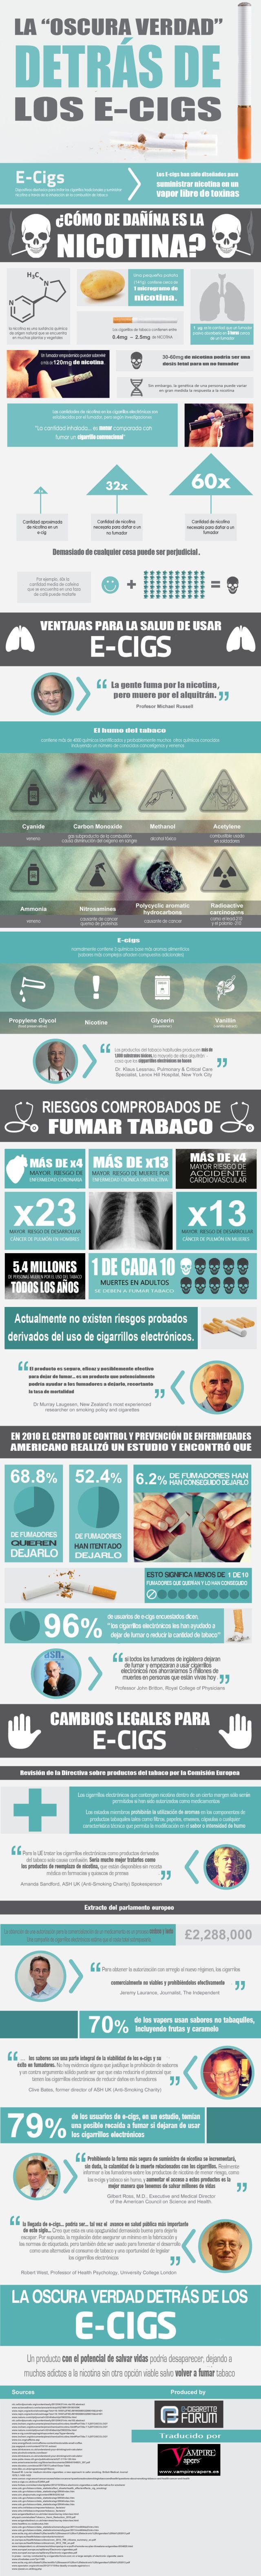 La oscura verdad de los cigarrillos electrónicos Infografía de alfredovela, vía infografiasencastellano.com